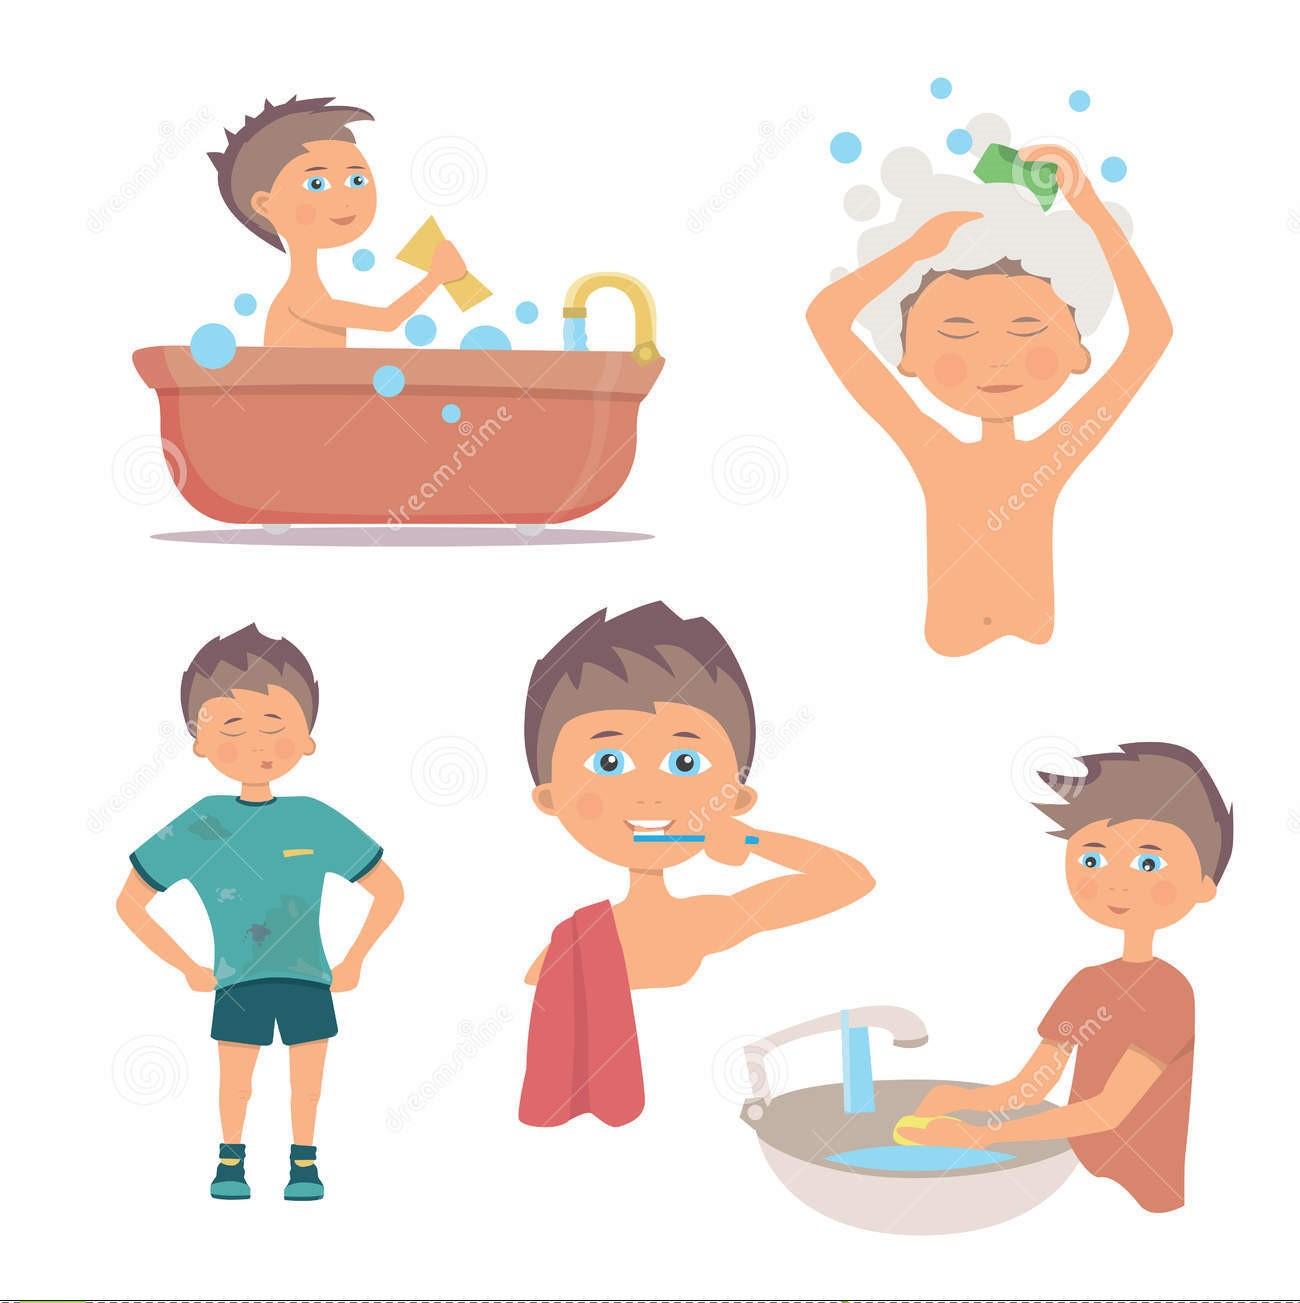 hygiene personal hands washing boy morning procedure tips persoonlijke van higiene hygiene body cartoon workplace clean ochtend het clipart zaragoza